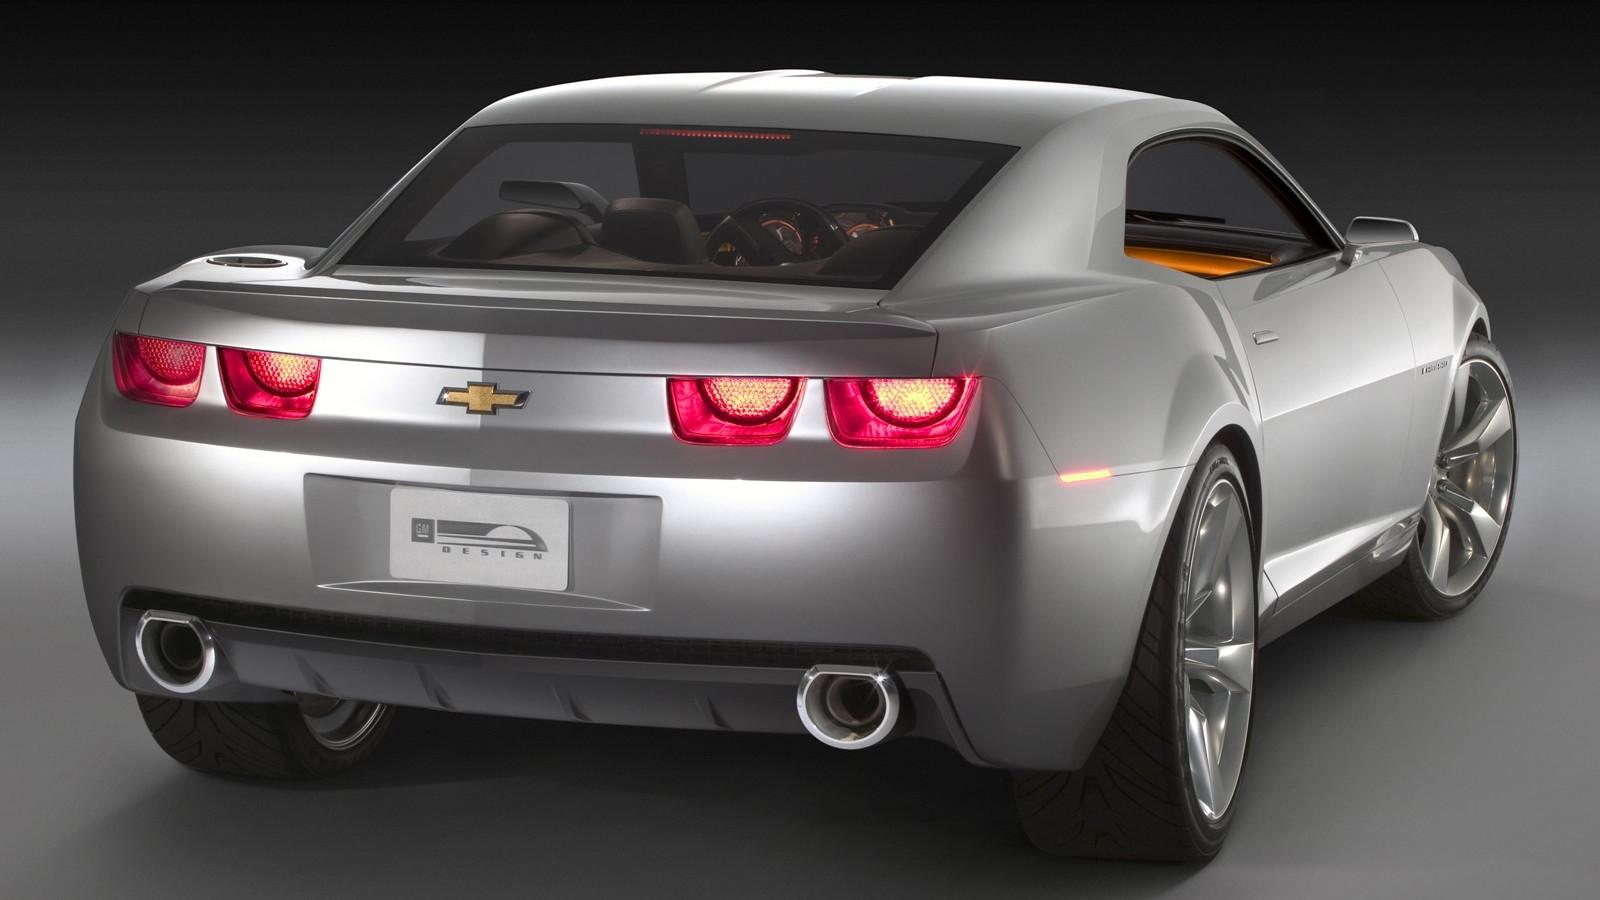 Chevrolet_Camaro_Concept_032.jpg